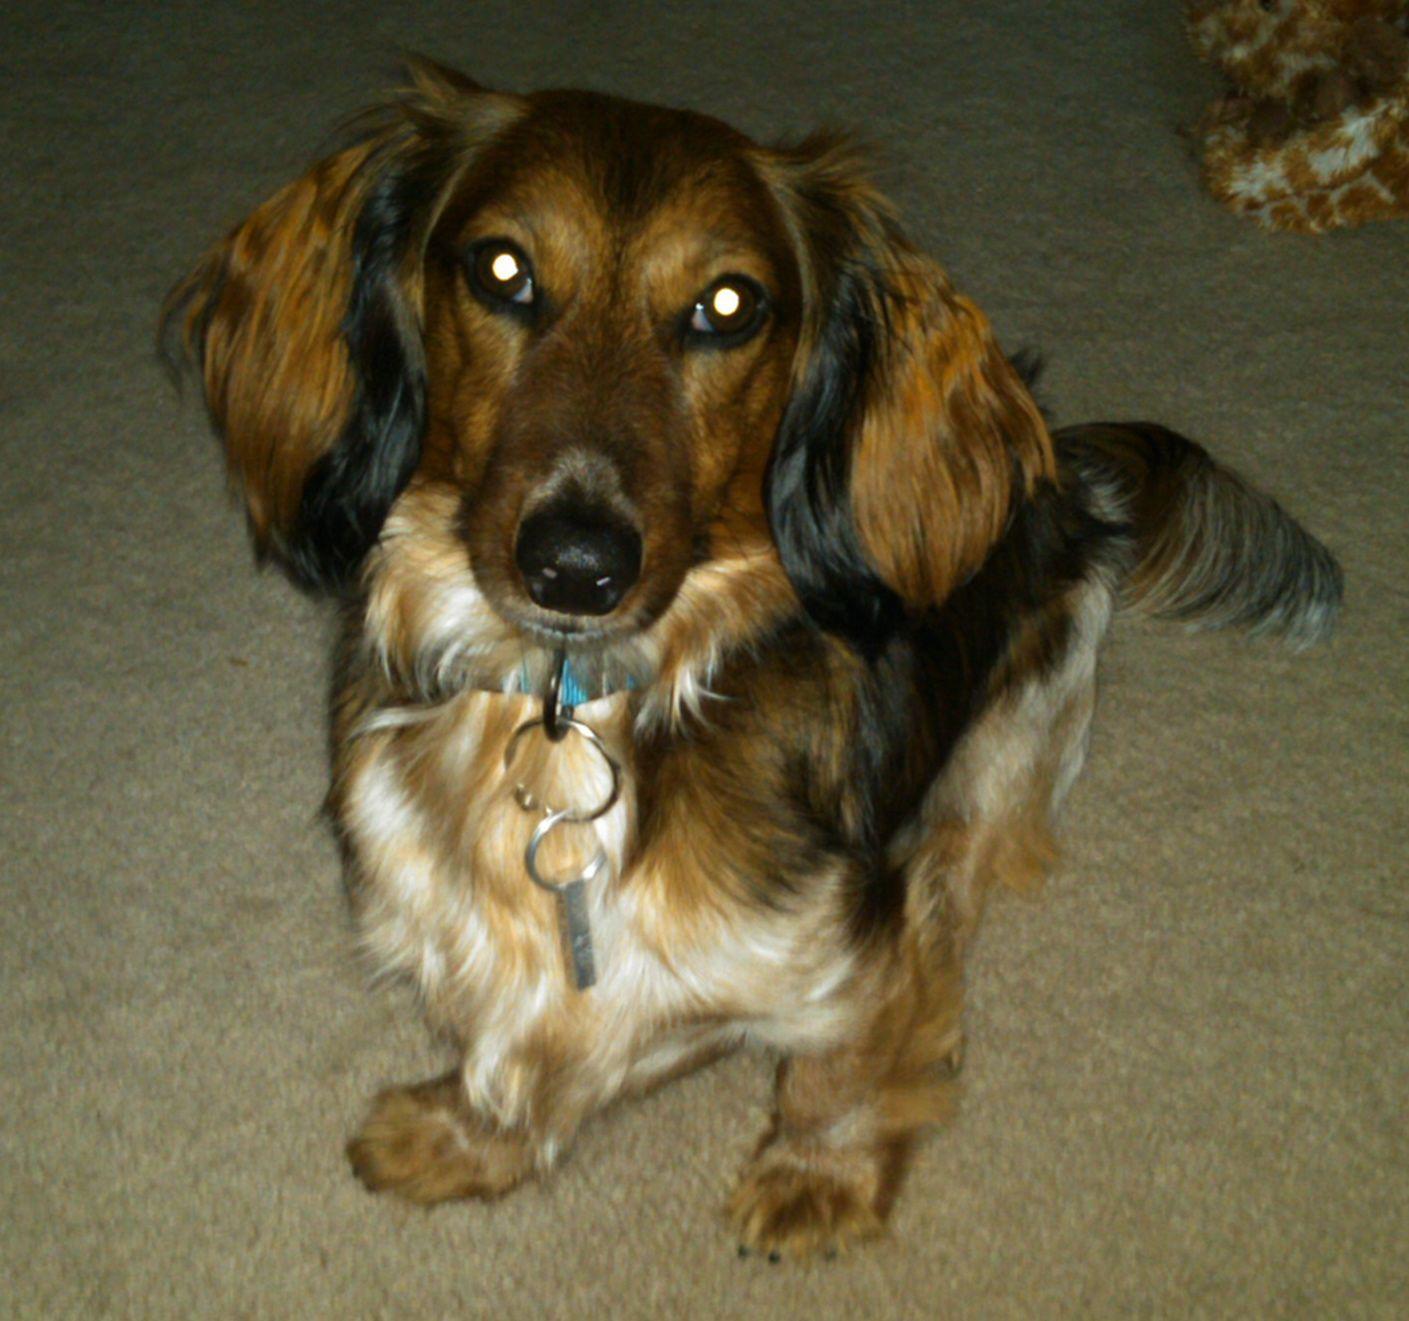 Wrigley The Long Haired Tweenie Weenie Dogs Dog Life Puppy Love